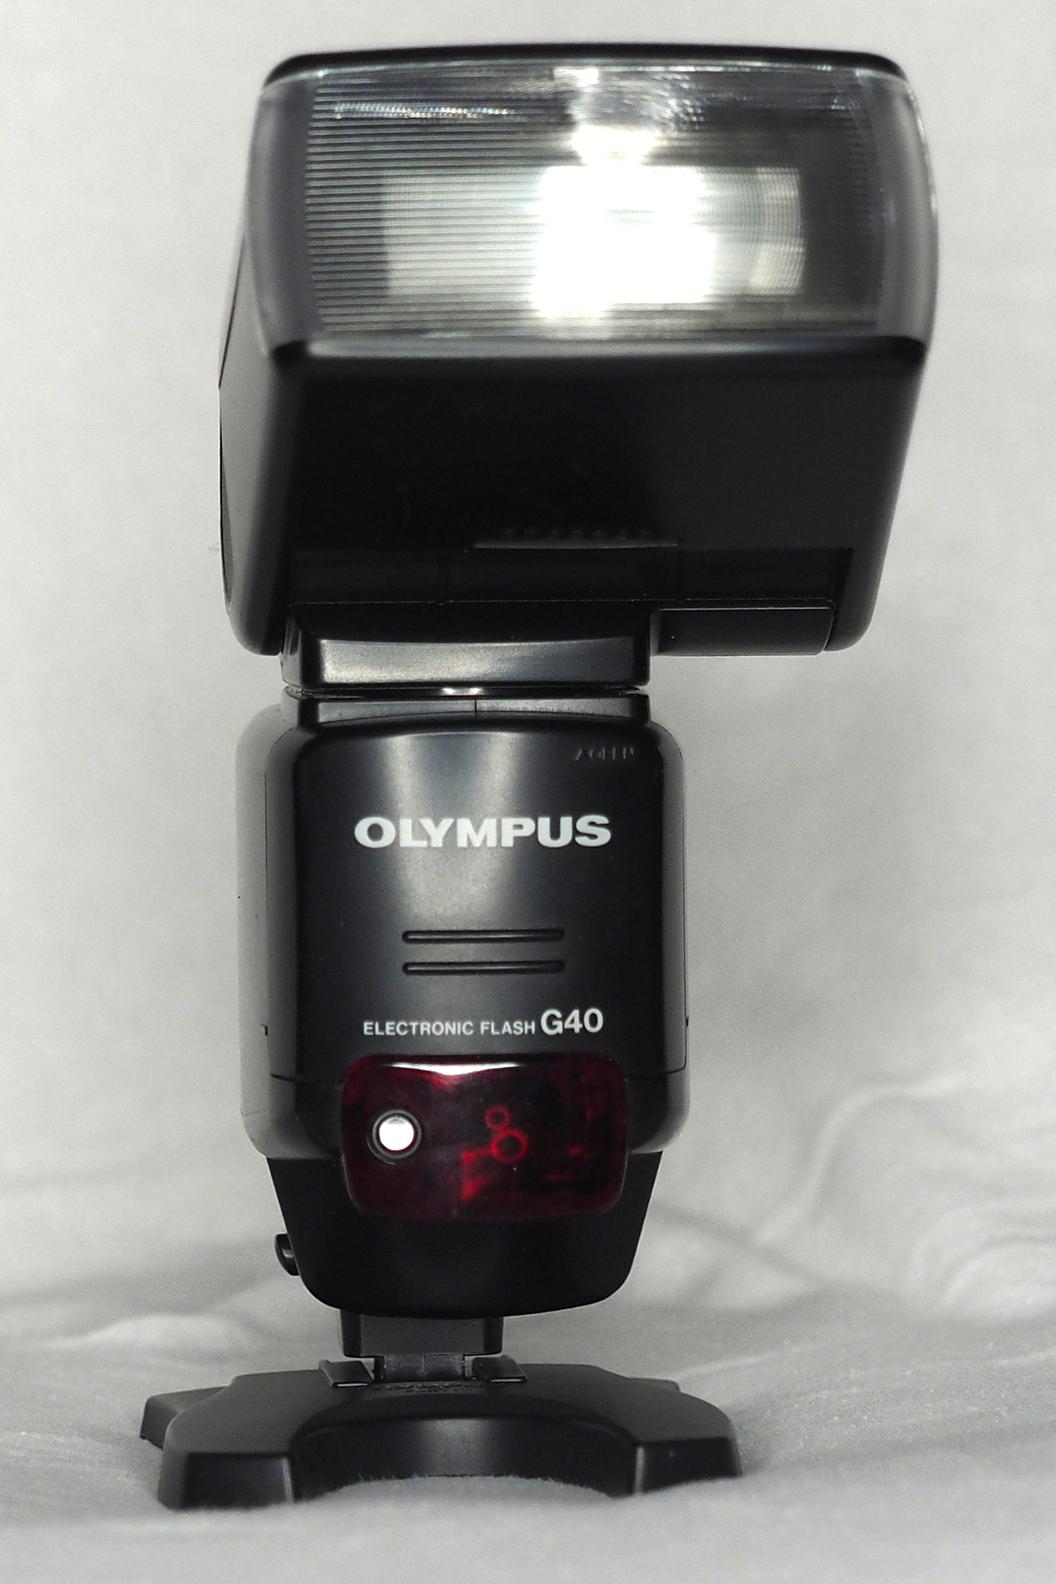 Olympus G40 flash (Pic: Bill Watts)